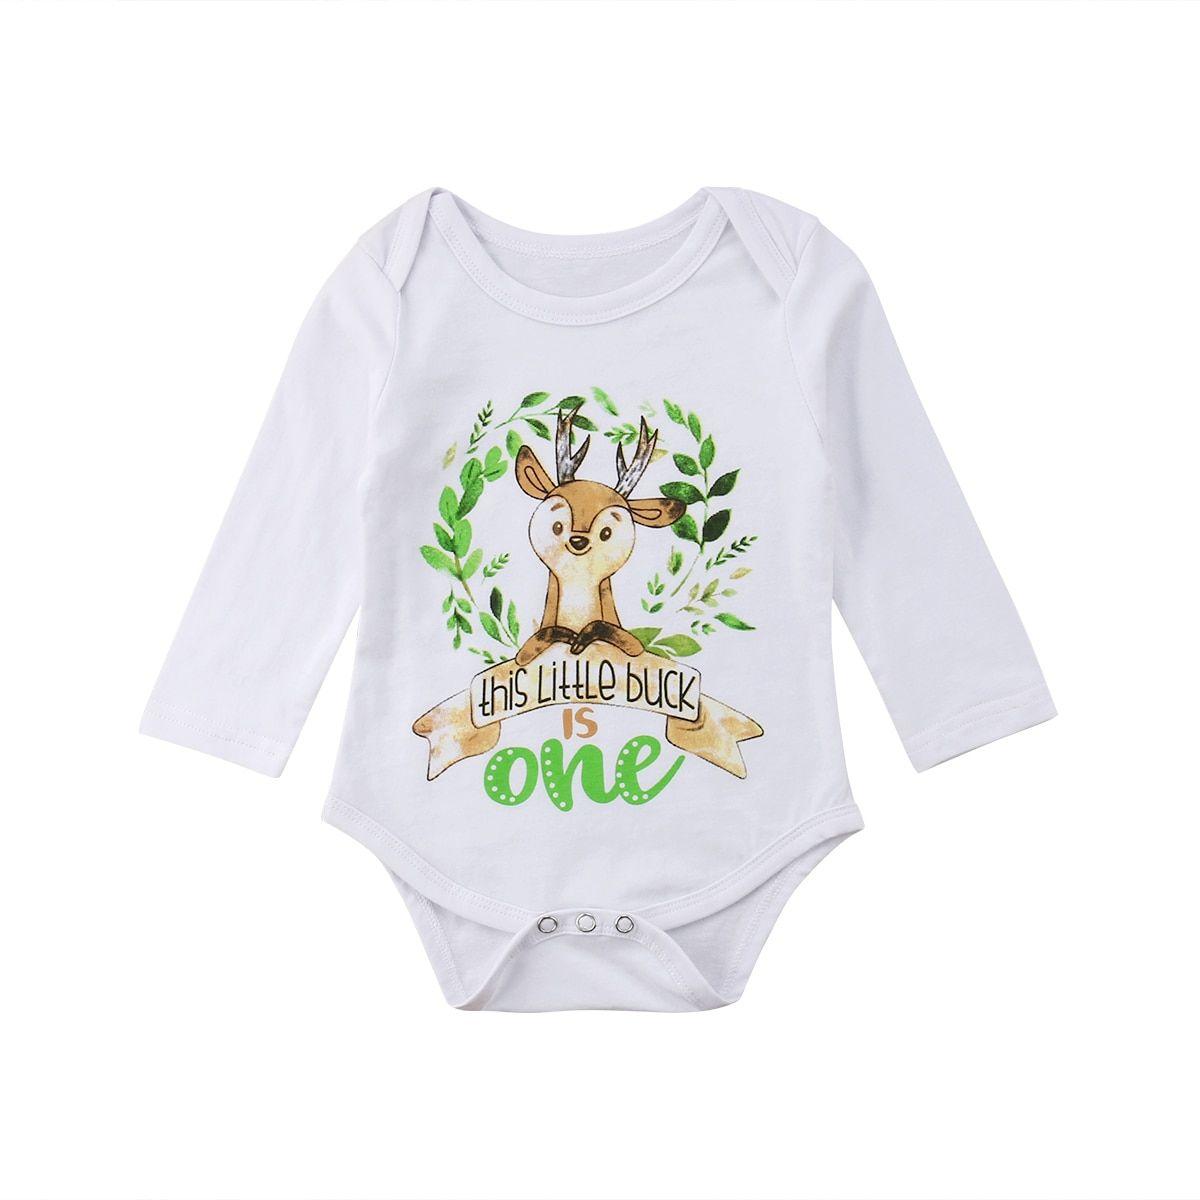 611c7e8c9d 0-24M Lovely Pretty Infant Baby Girls Boys Autumn Bodysuits Long Sleeve  Cartoon Print White